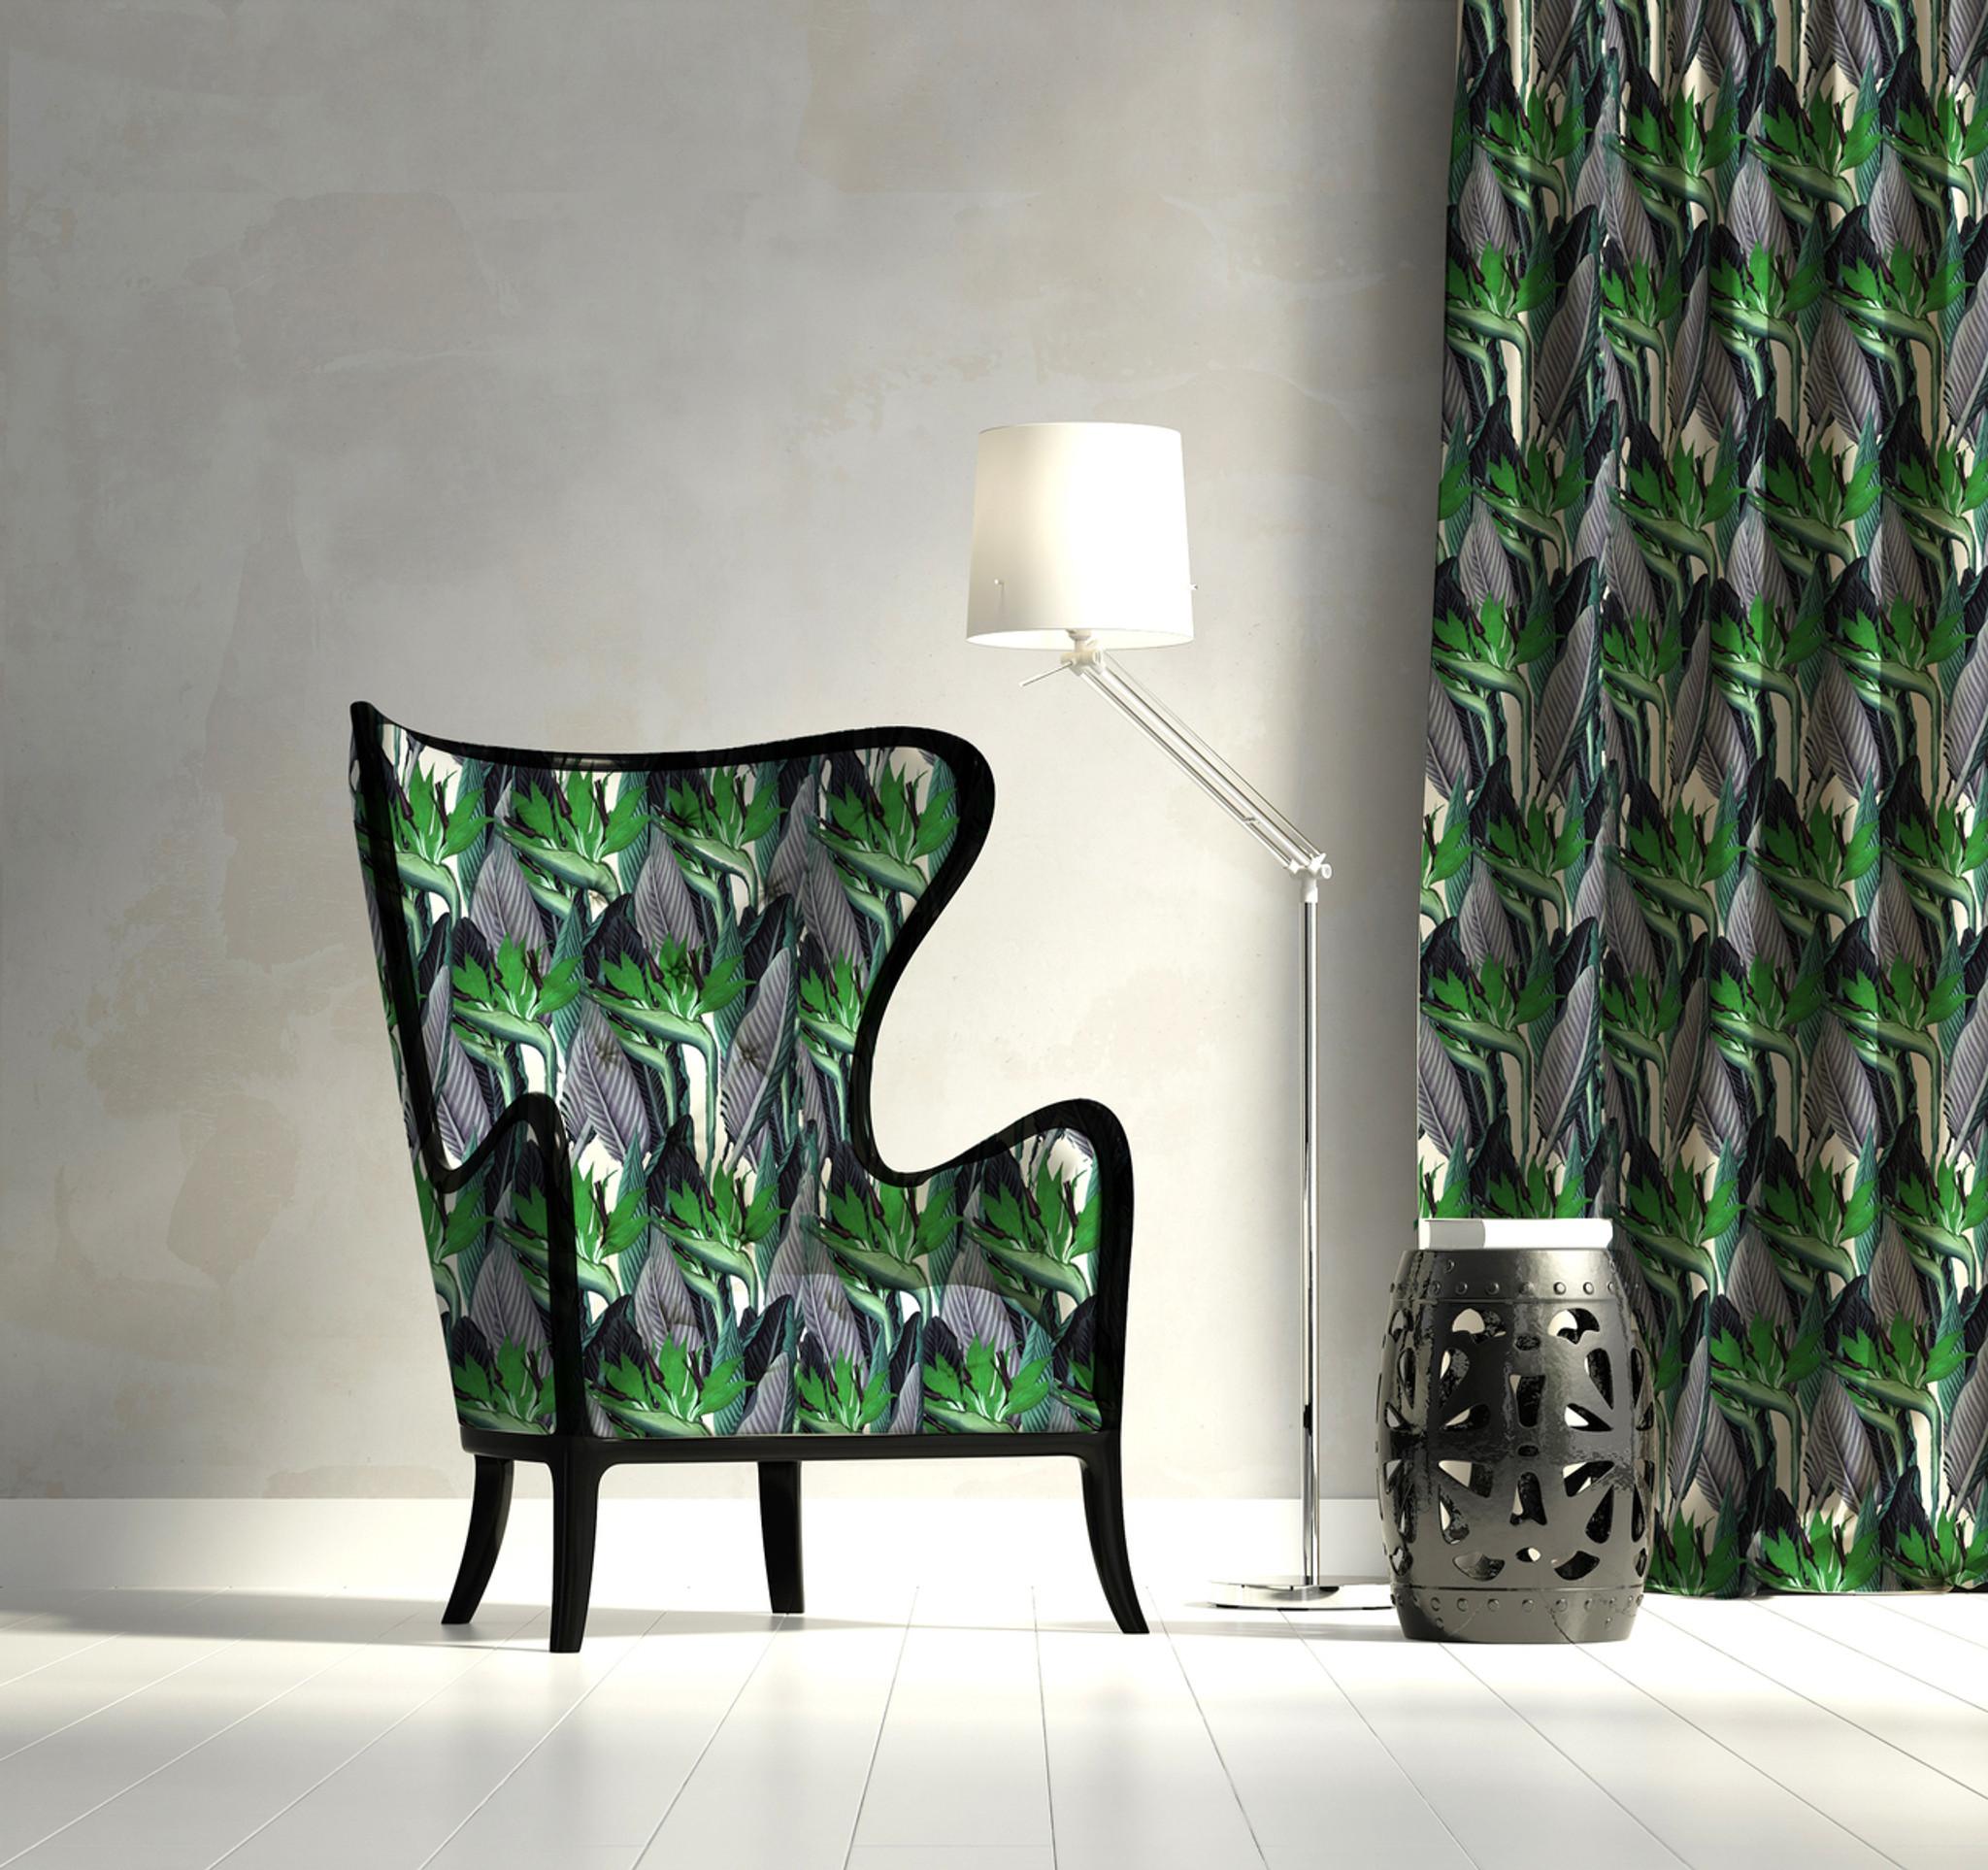 Fabric - Strelitzia - Green